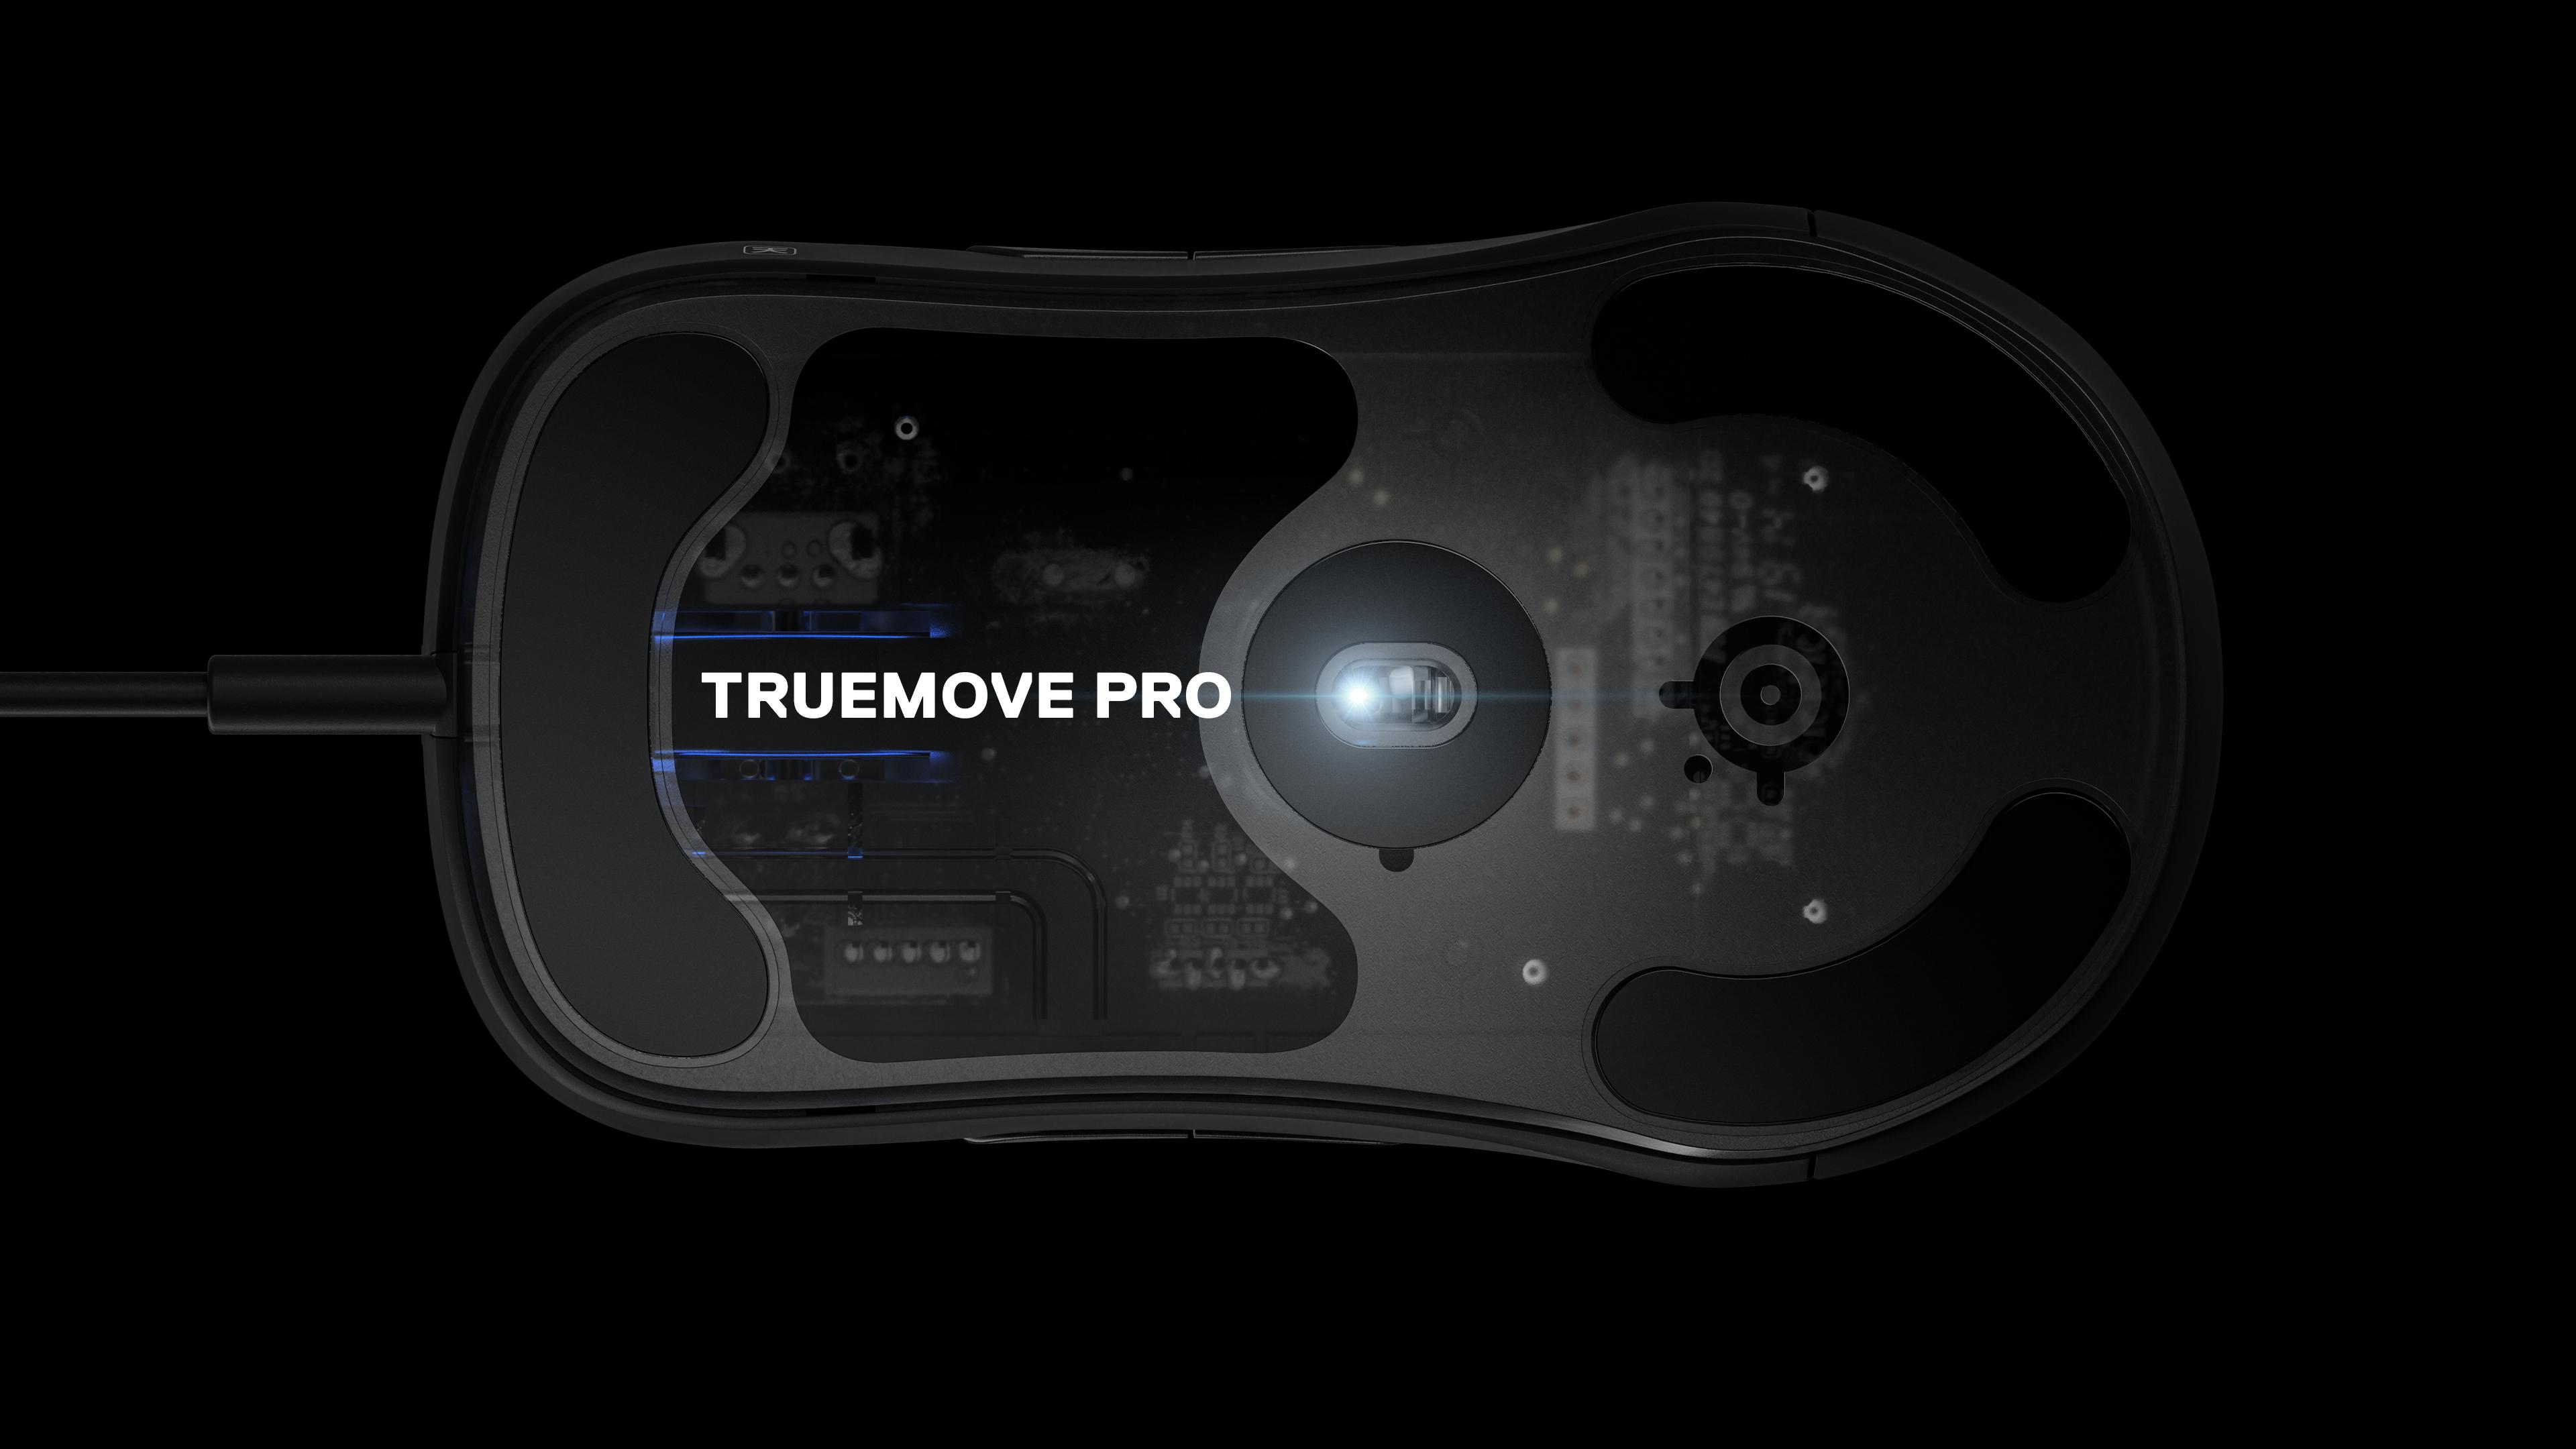 TrueMove Pro